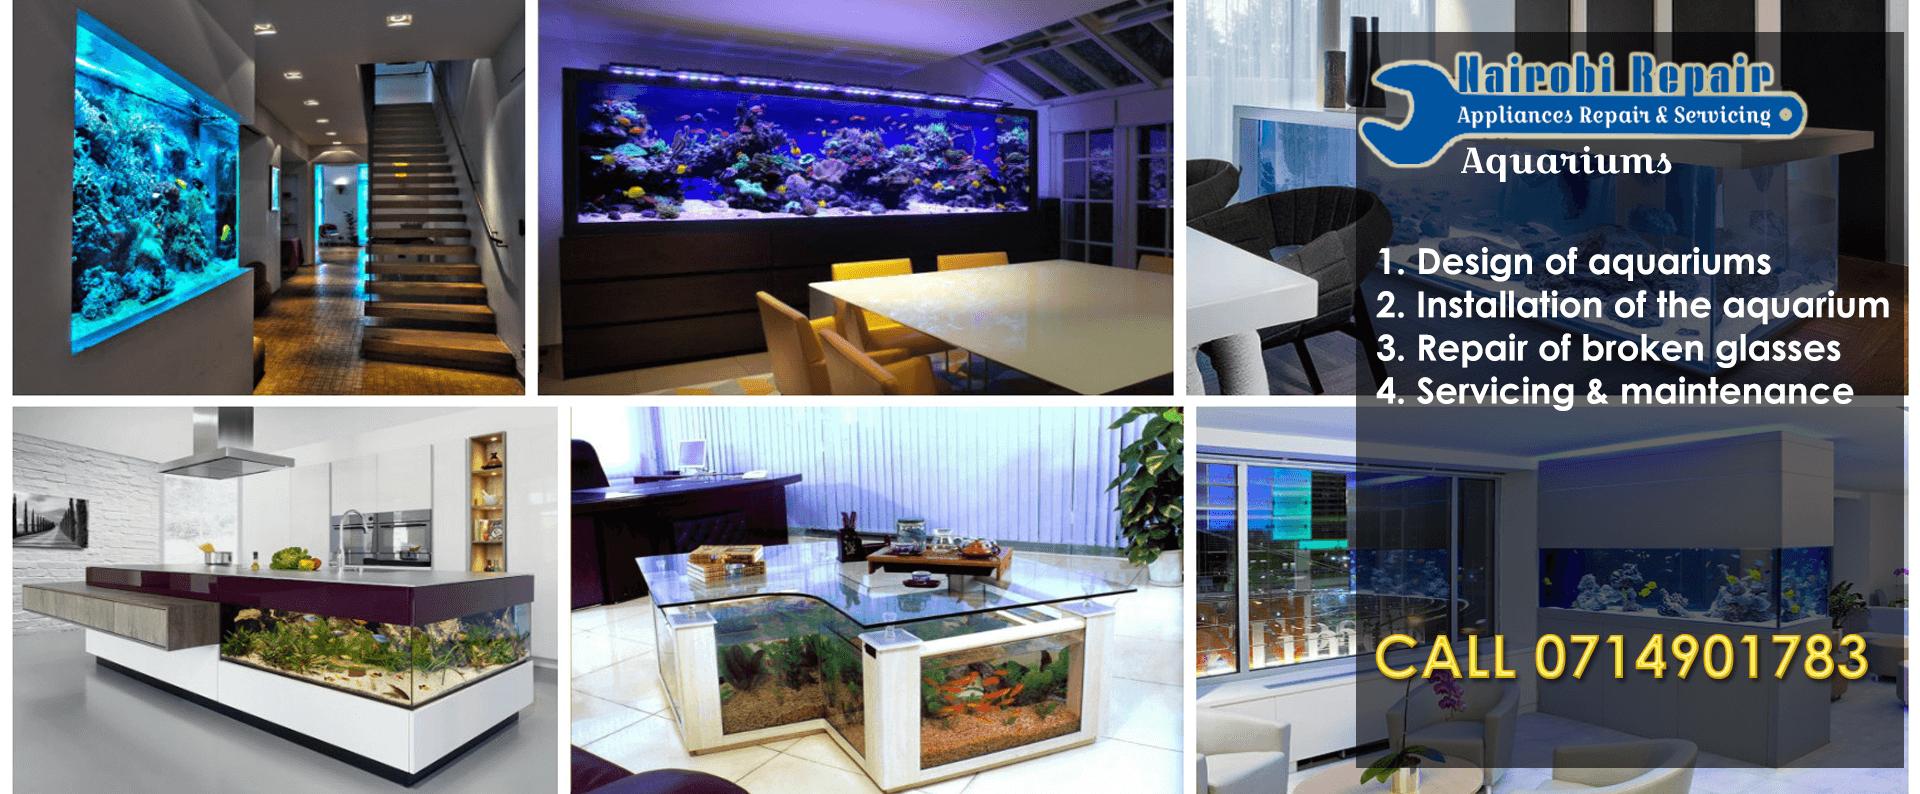 Aquarium services - Nairobi, Kenya